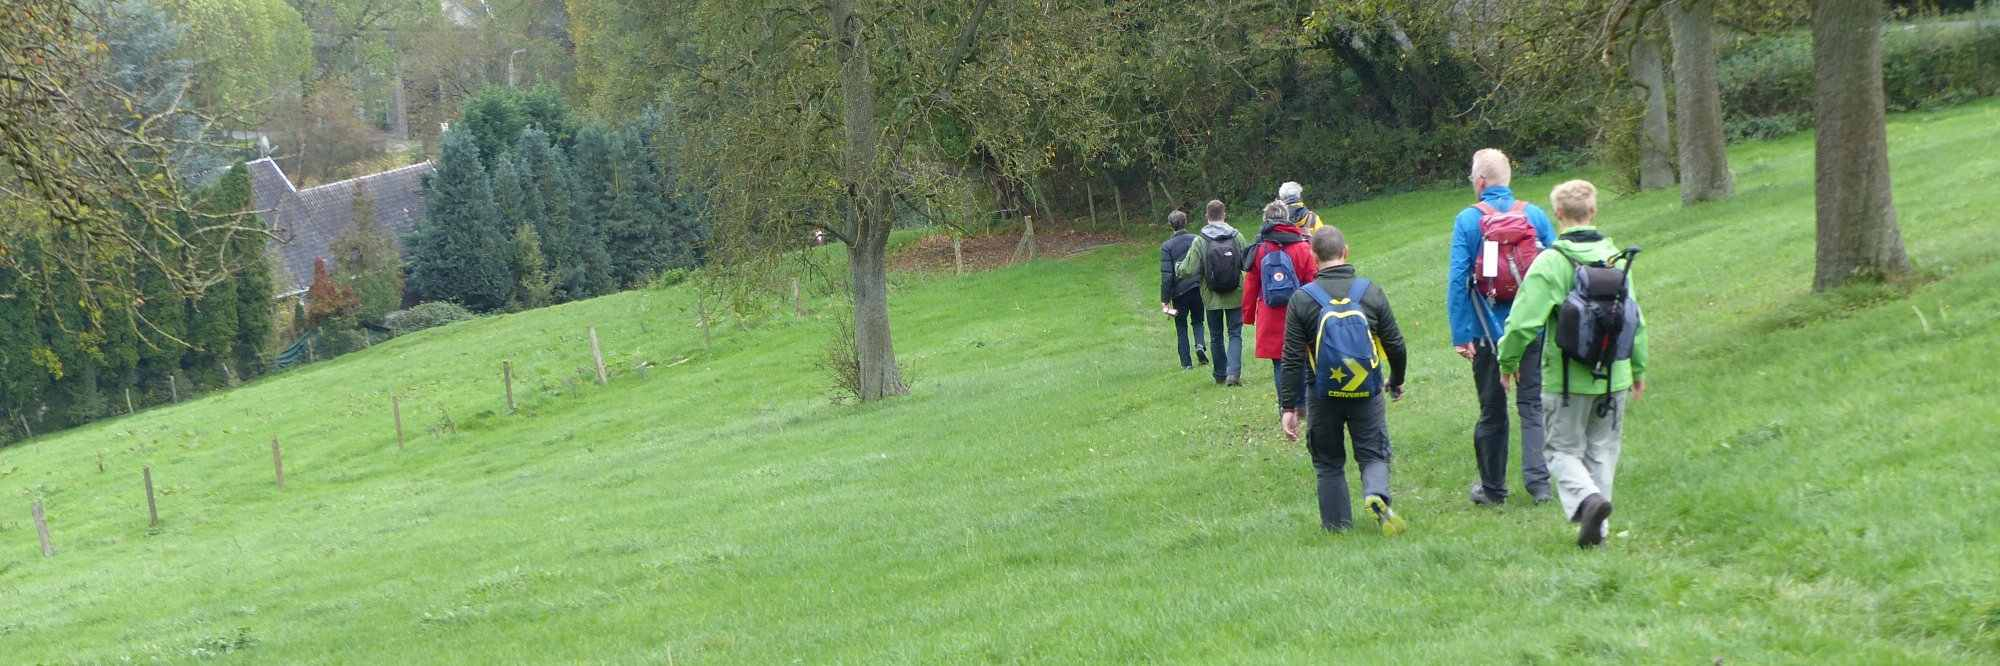 header foto wandeling rondom zuid-limburg